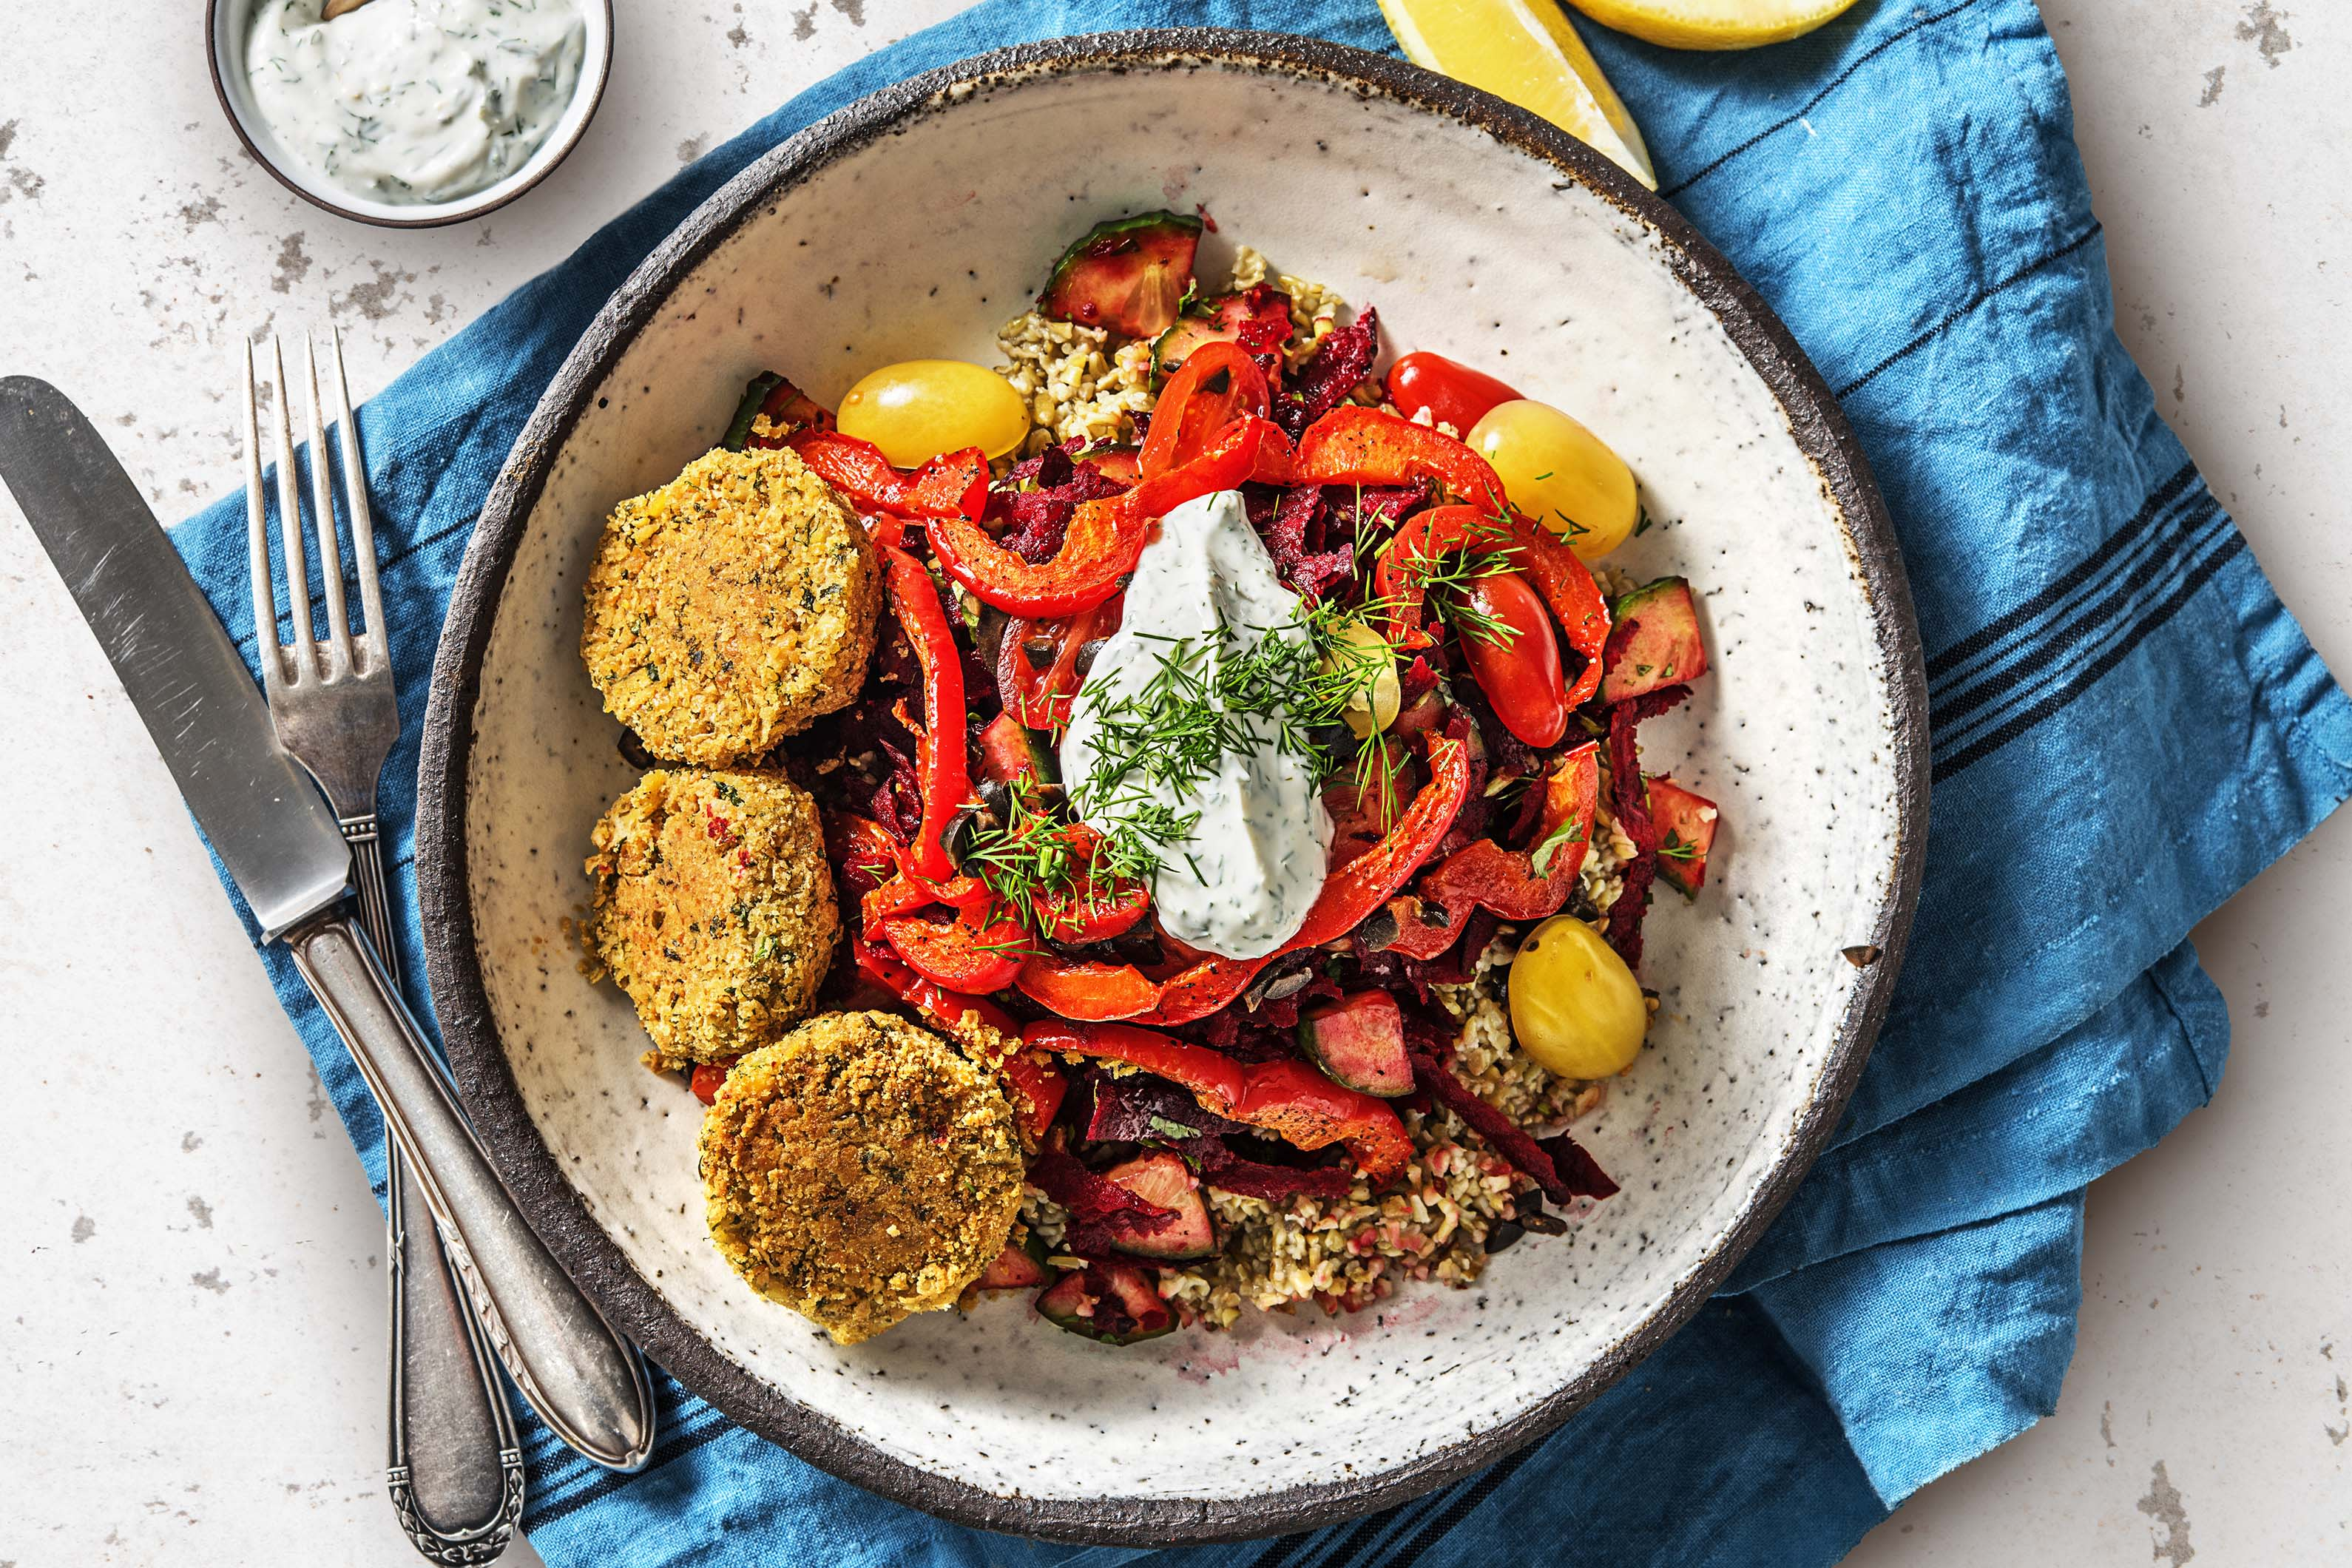 Mediterranean Falafel Bowl (v)